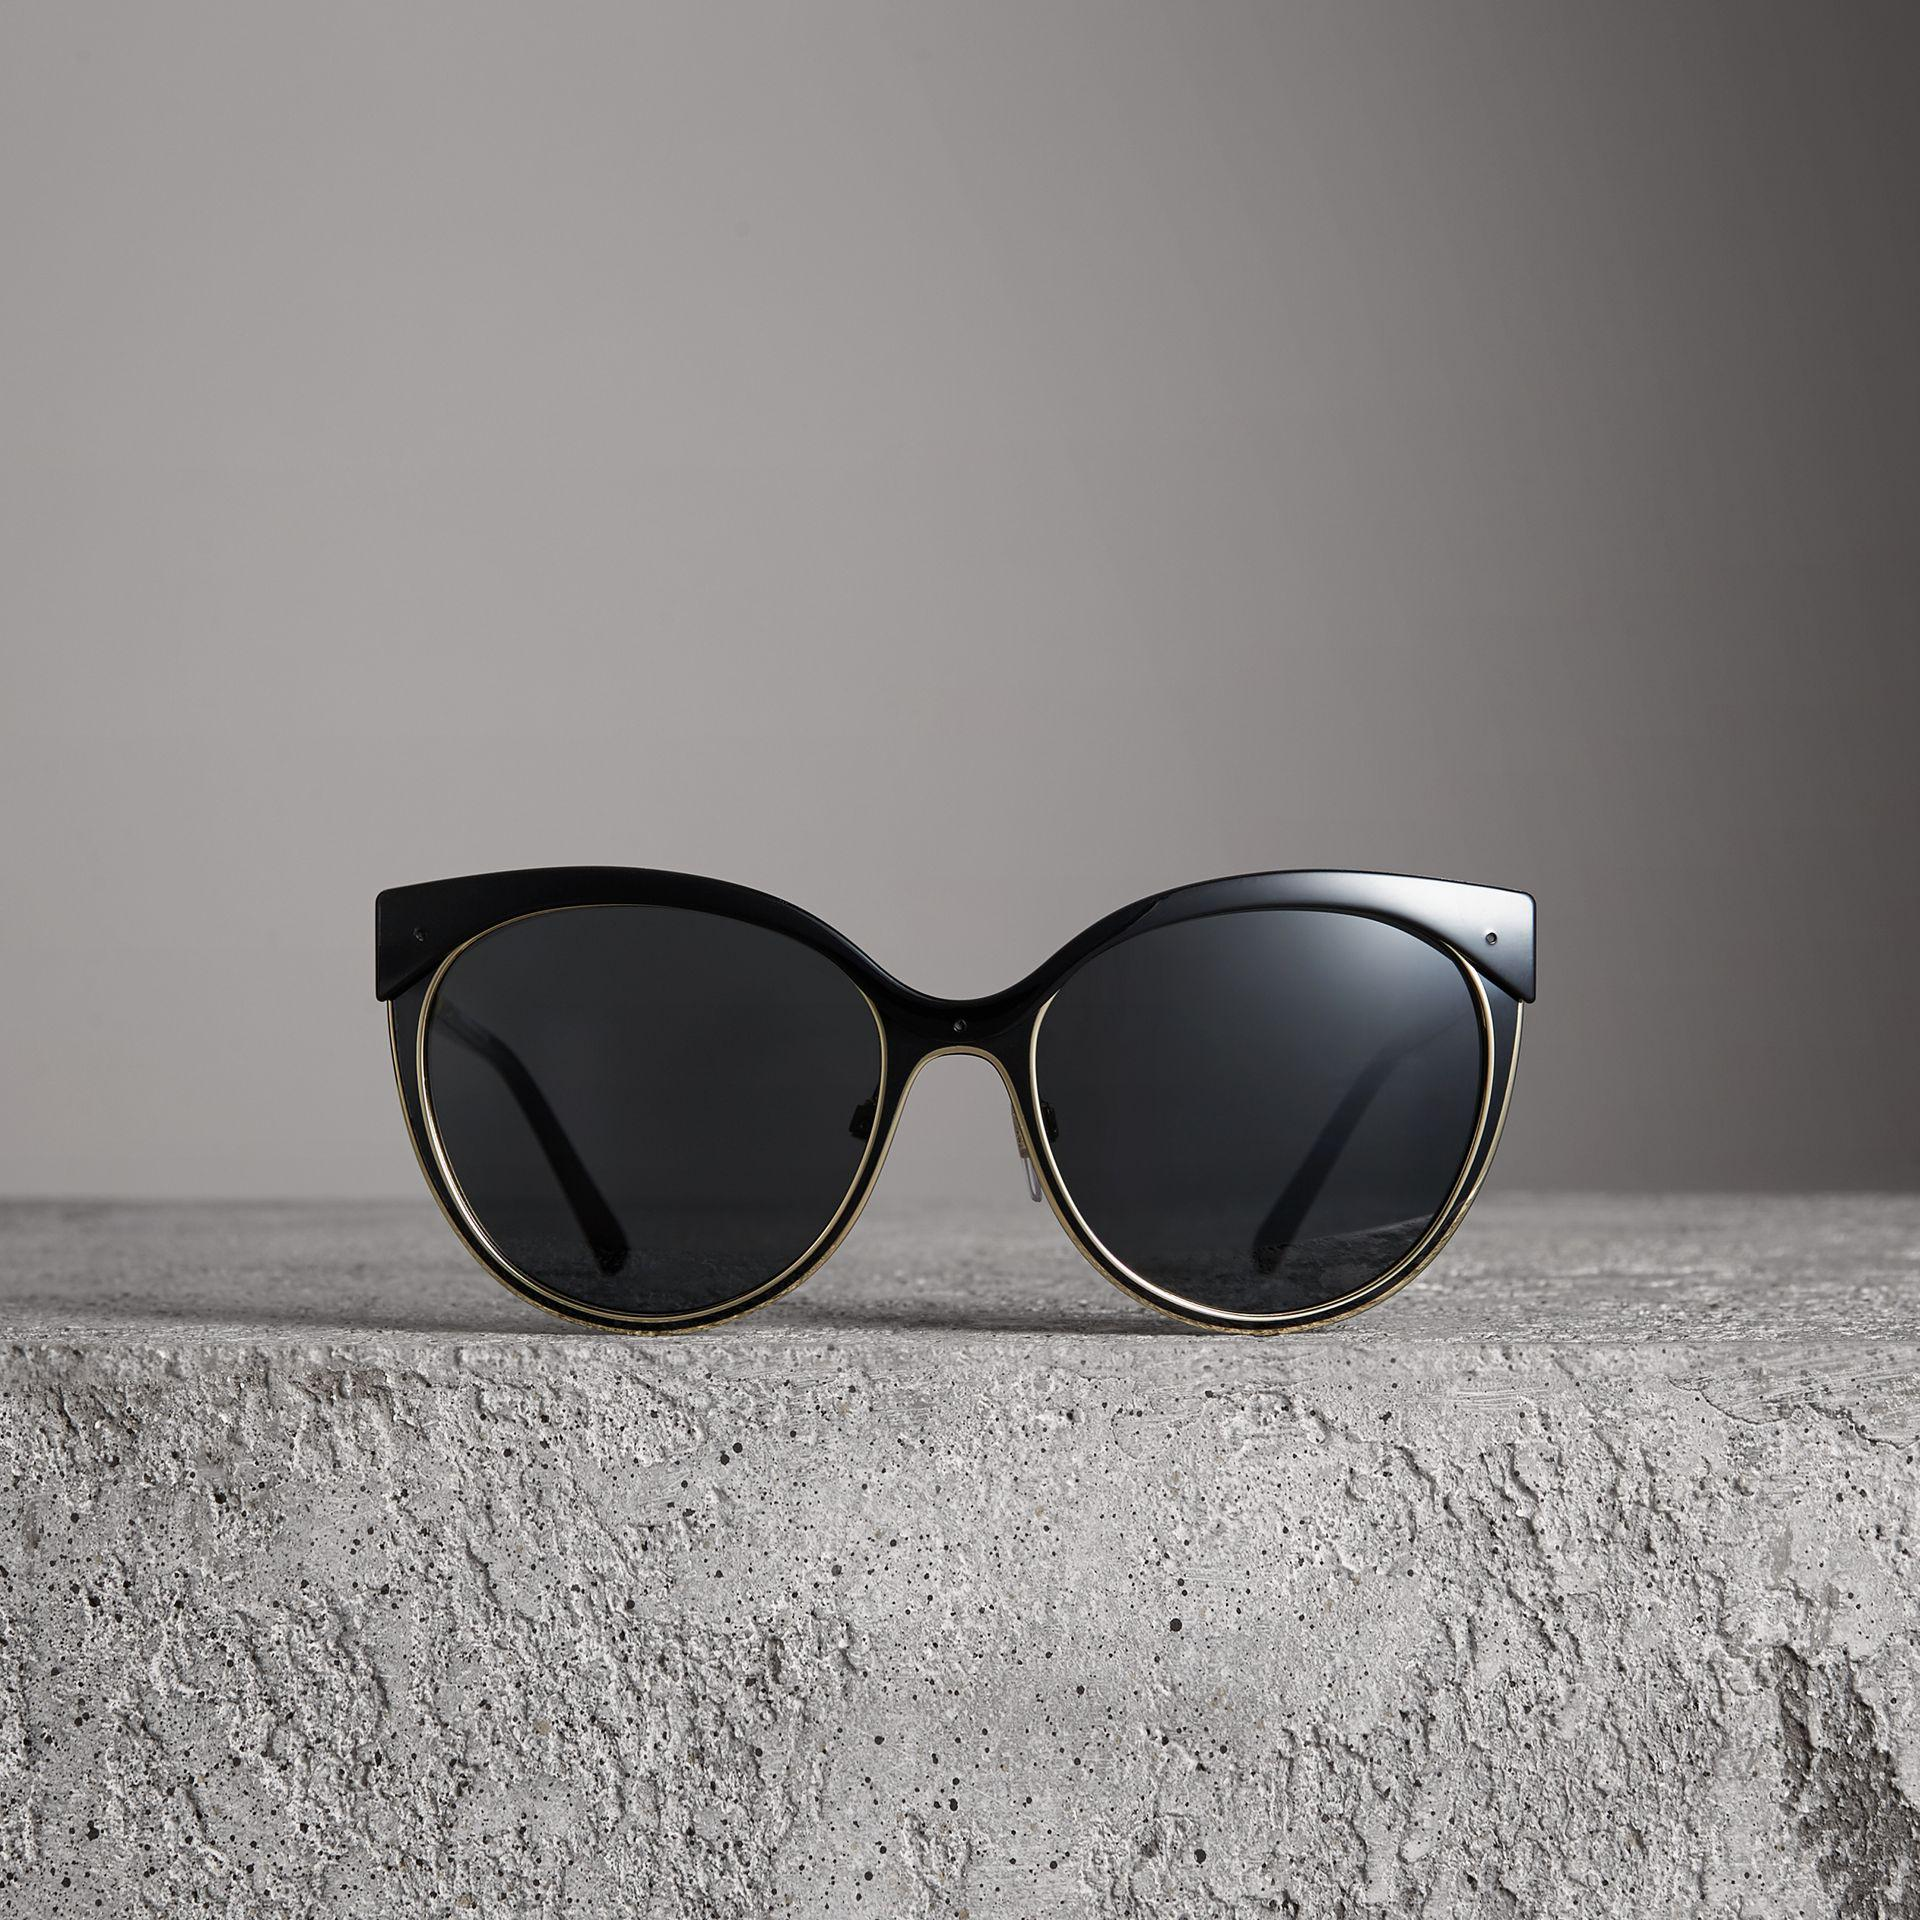 23ca24ec66 Burberry Cat Eye Sunglasses Black - Image Of Glasses